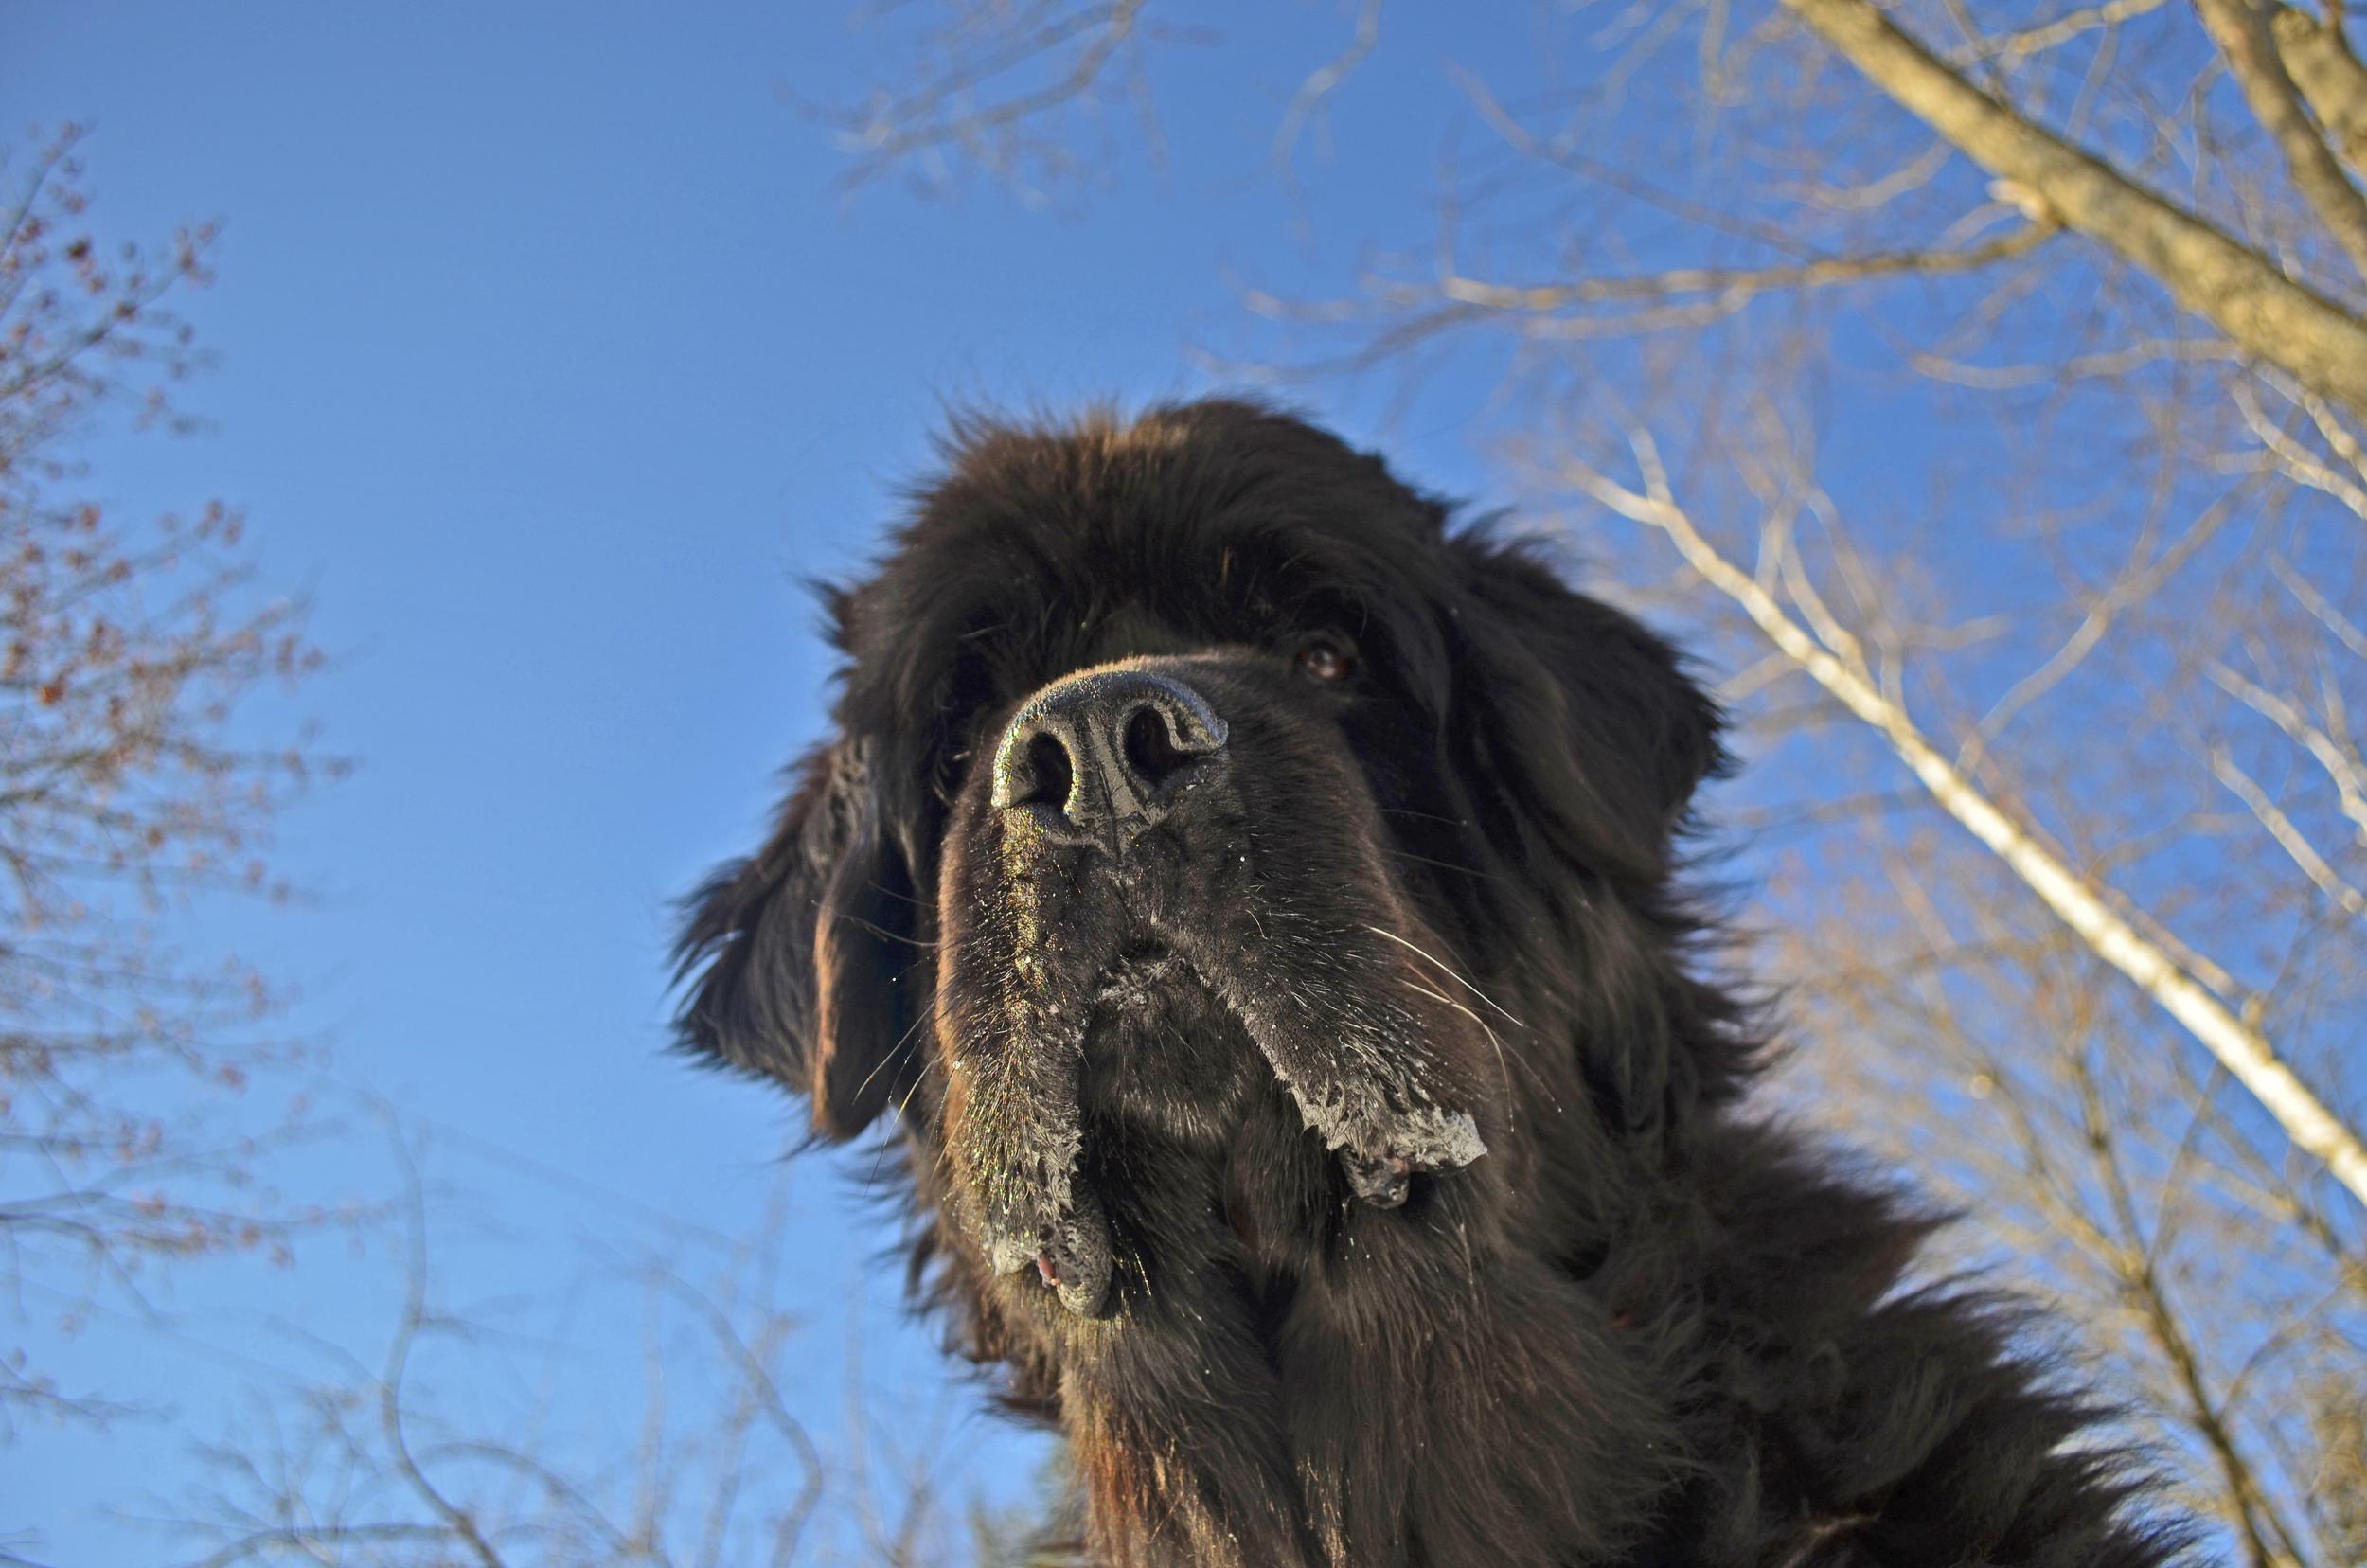 Skyla looking up 2014-01-08 012.jpg